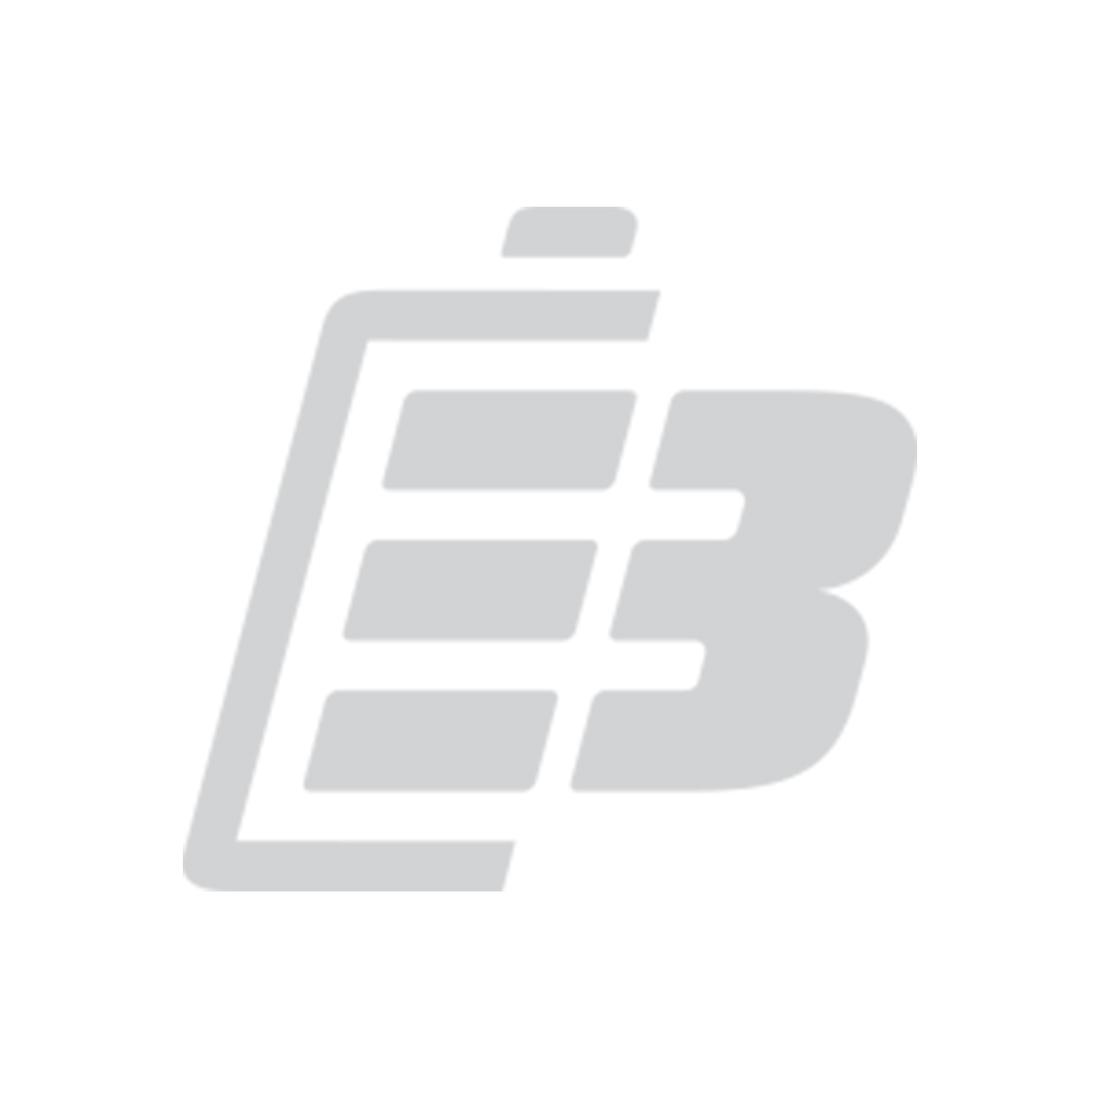 Laptop battery HP Envy 6-1000_1